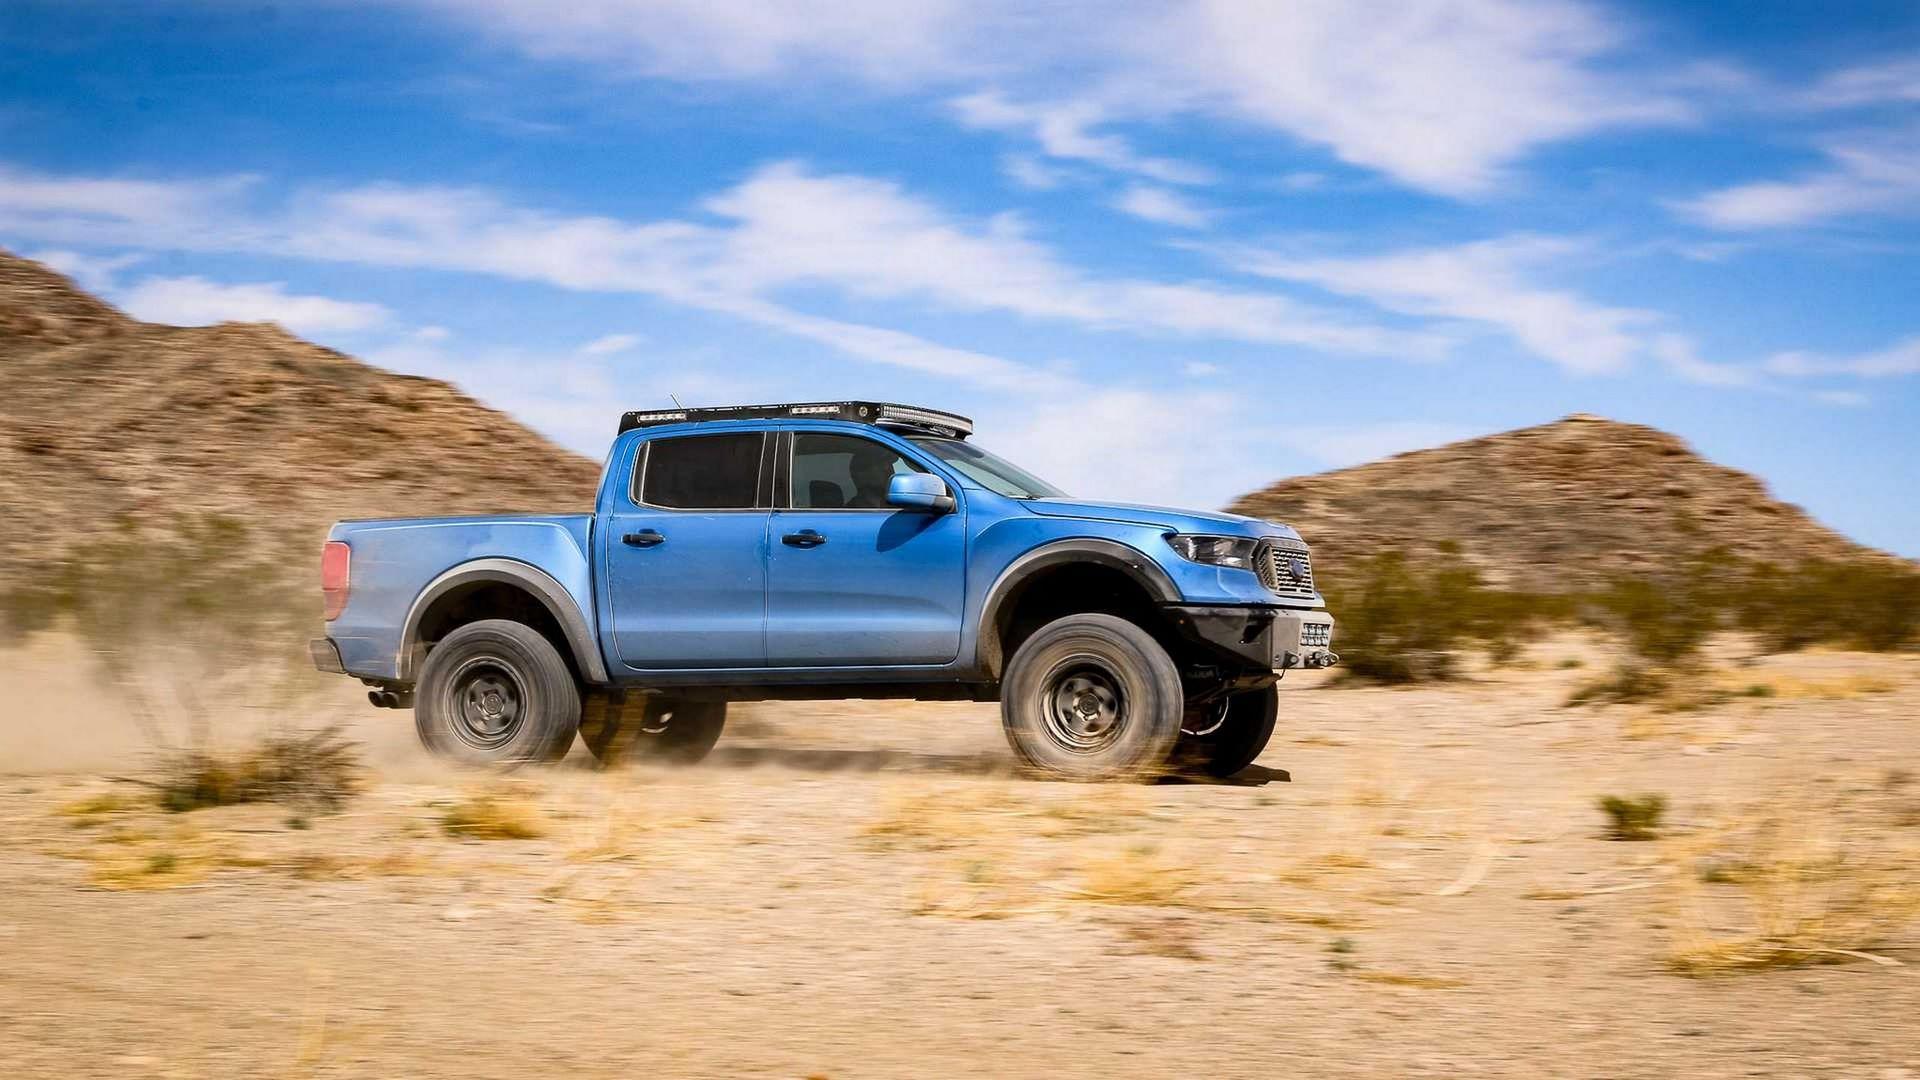 Ford-Ranger-Prorunner-By-APG-17